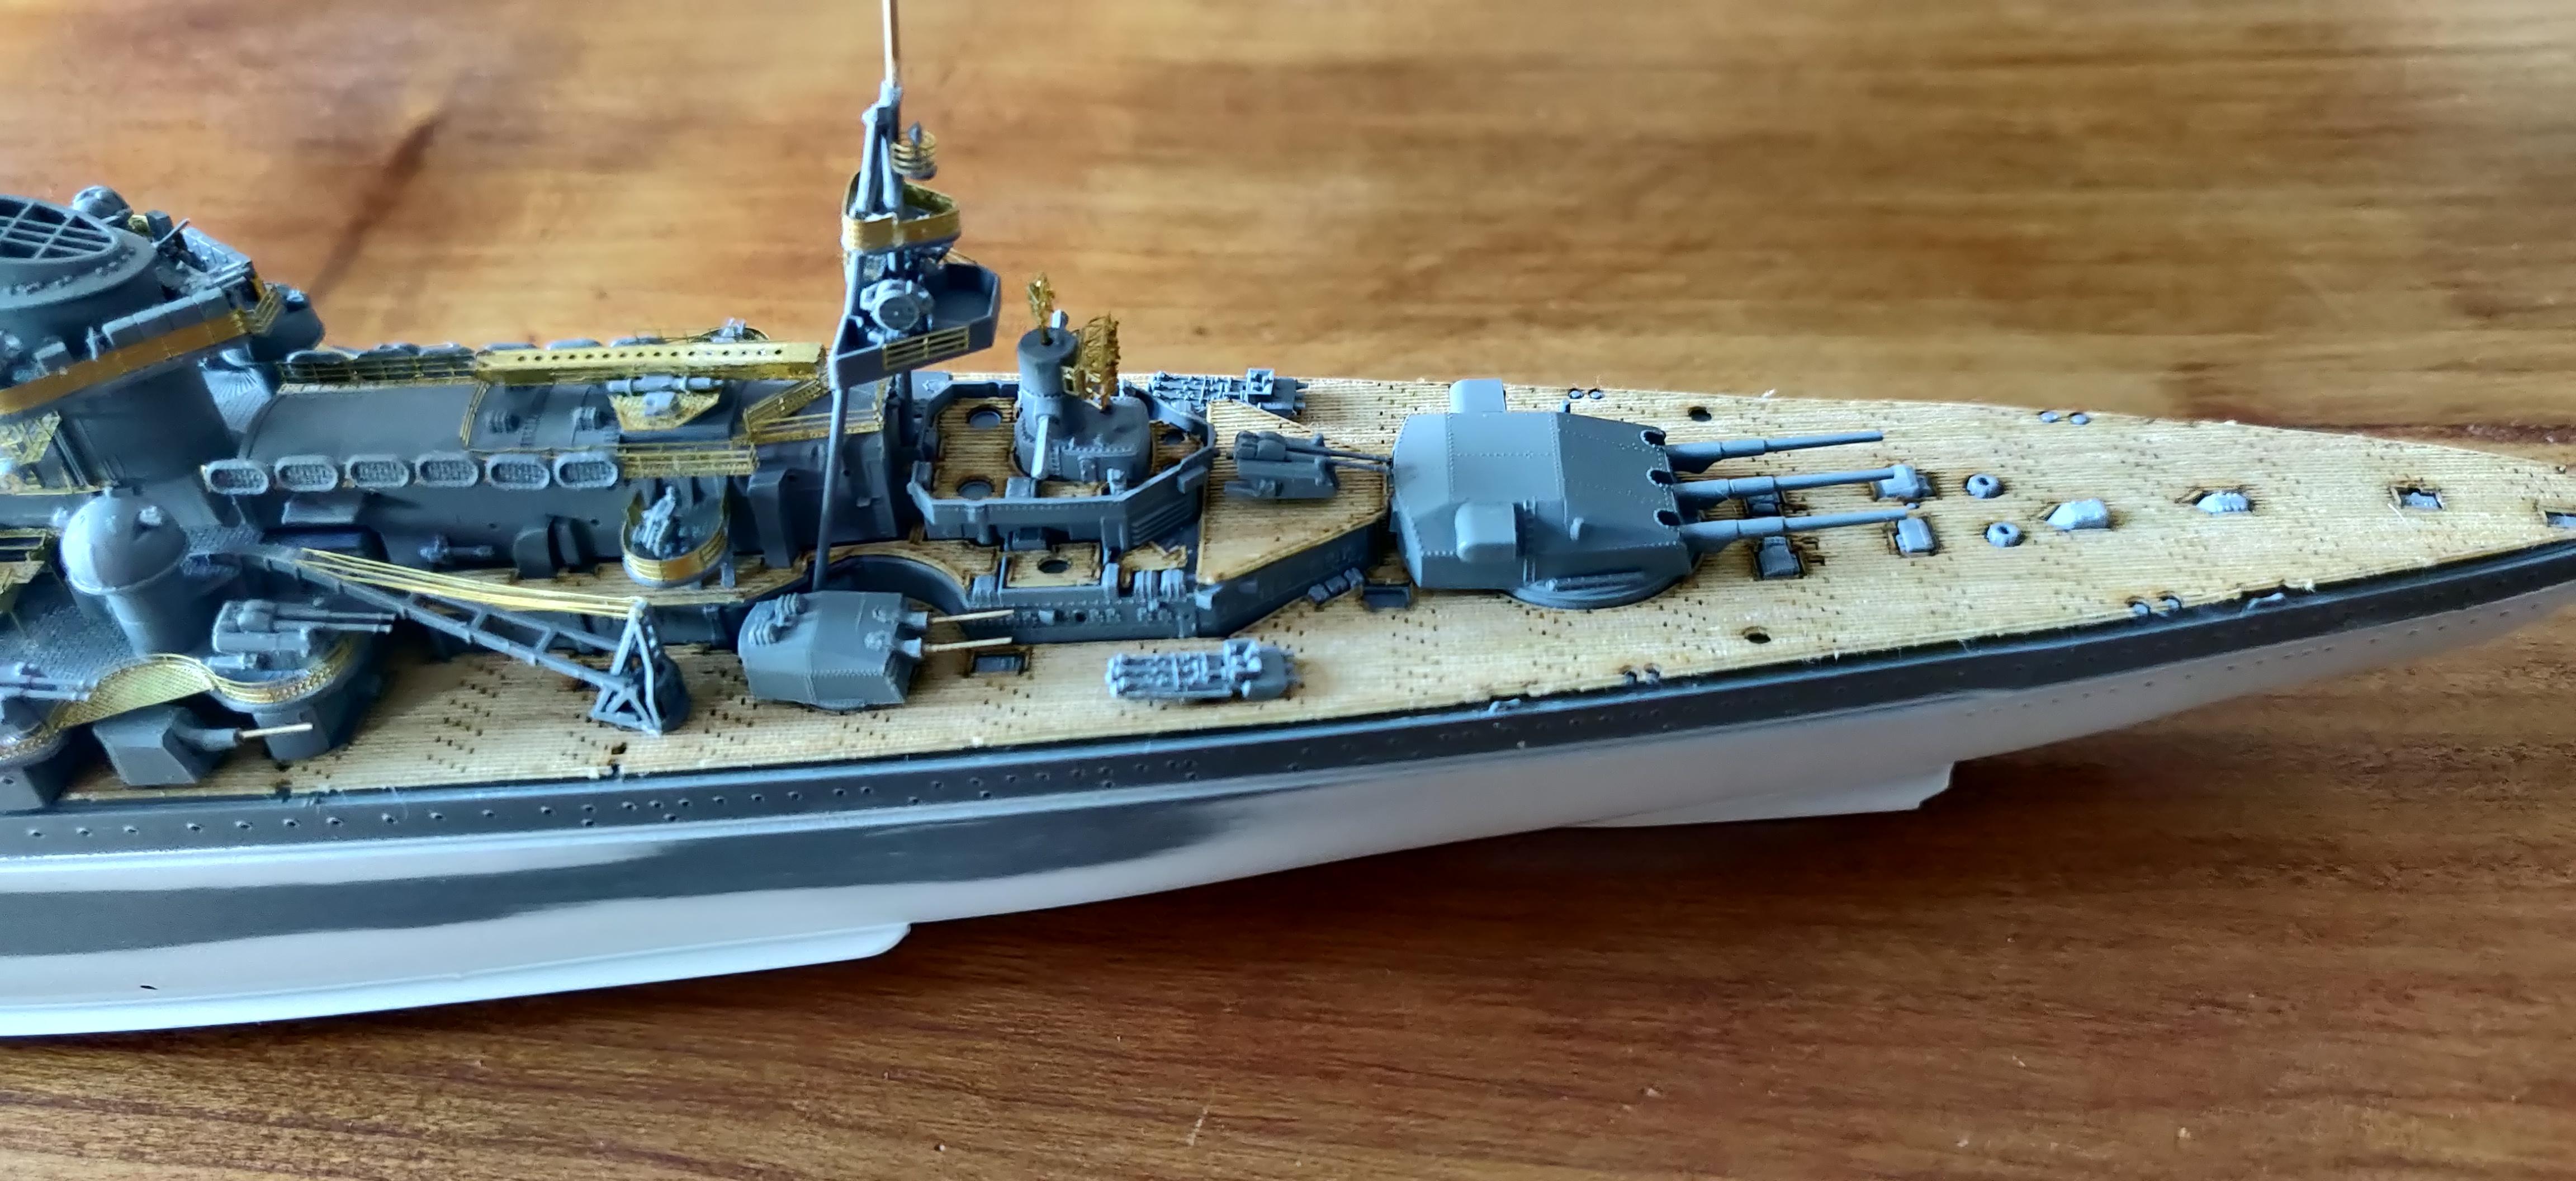 scharnhorst flyhawk 1943 1/700 IMG_20200513_190425